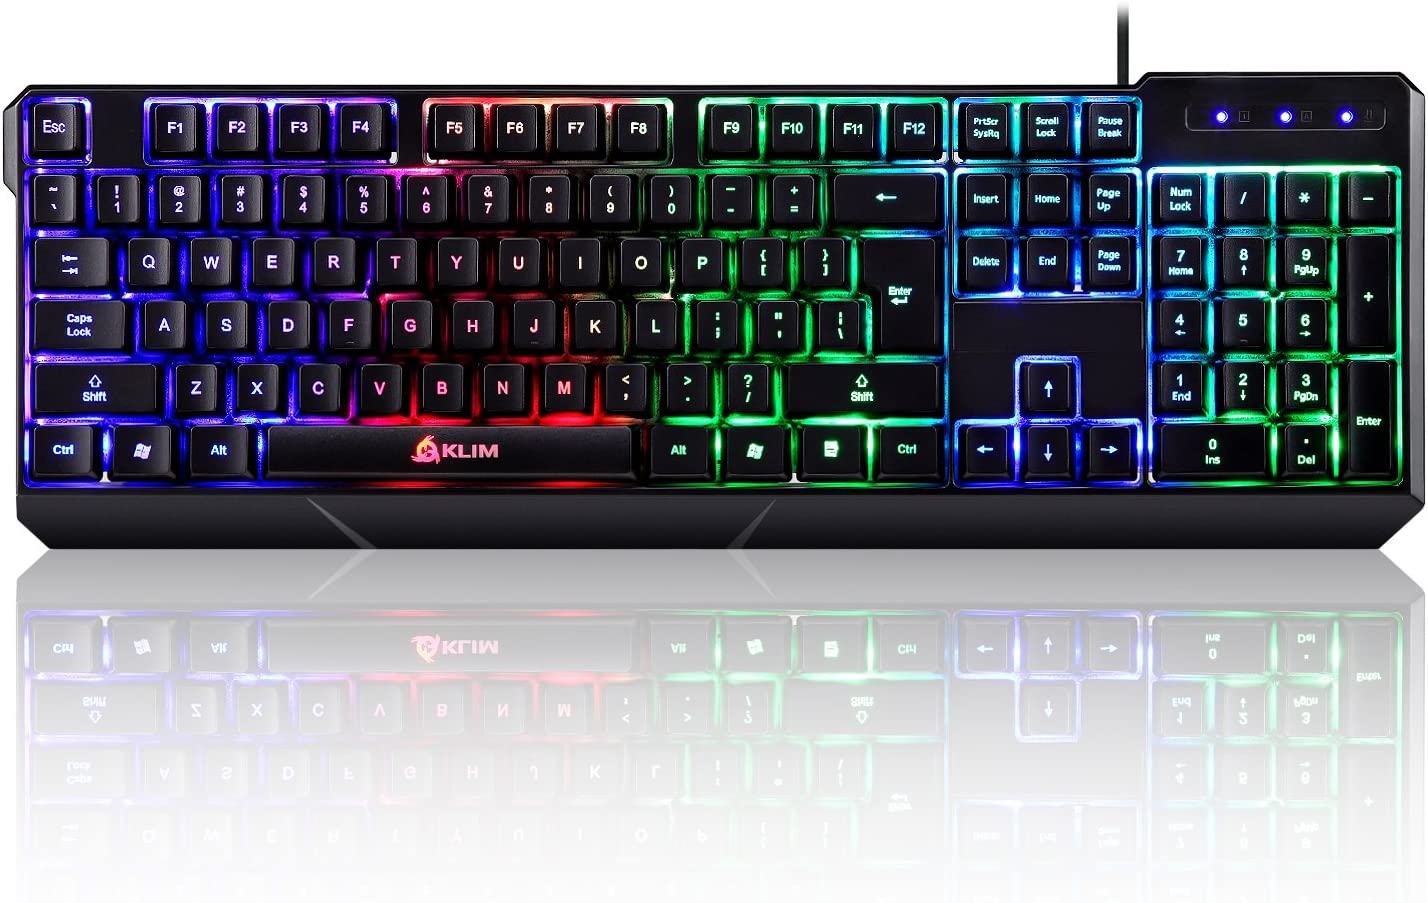 Klim Chroma Backlit Gaming Keyboard Wired Usb Votre Led Rainbow Lighting Ergonomic Quiet Water Resistant Black Rgb Pc Windows Ps4 Mac